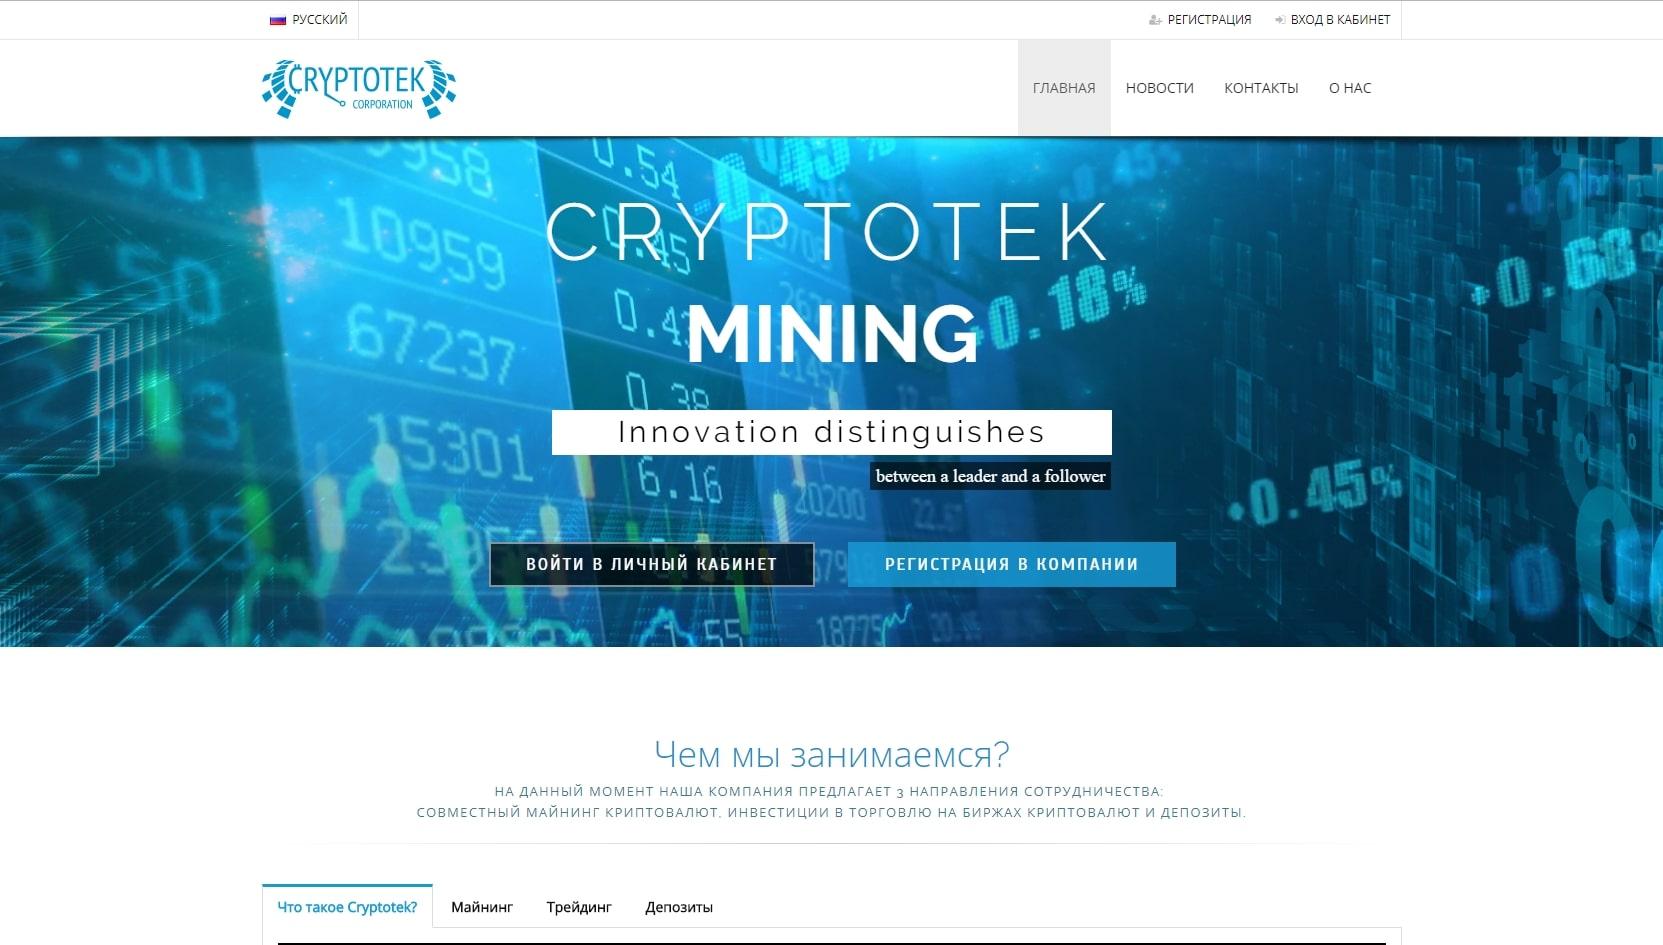 Главная страница сайта Cryptotek